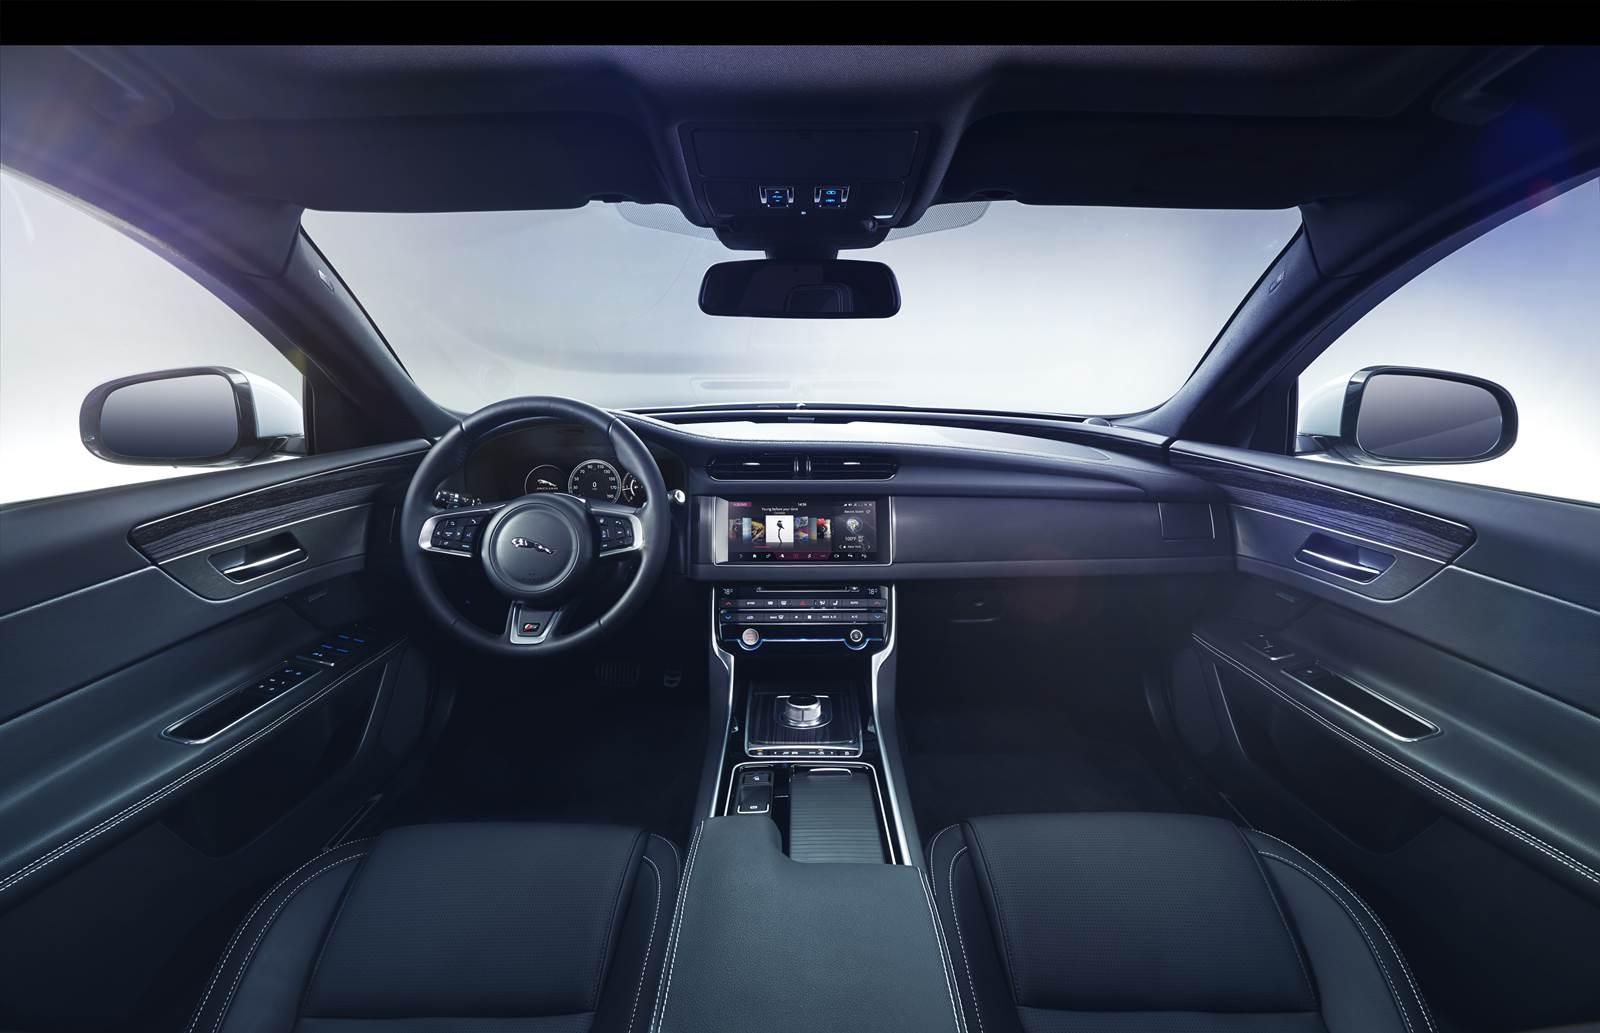 Novo Jaguar XF 2016 - painel